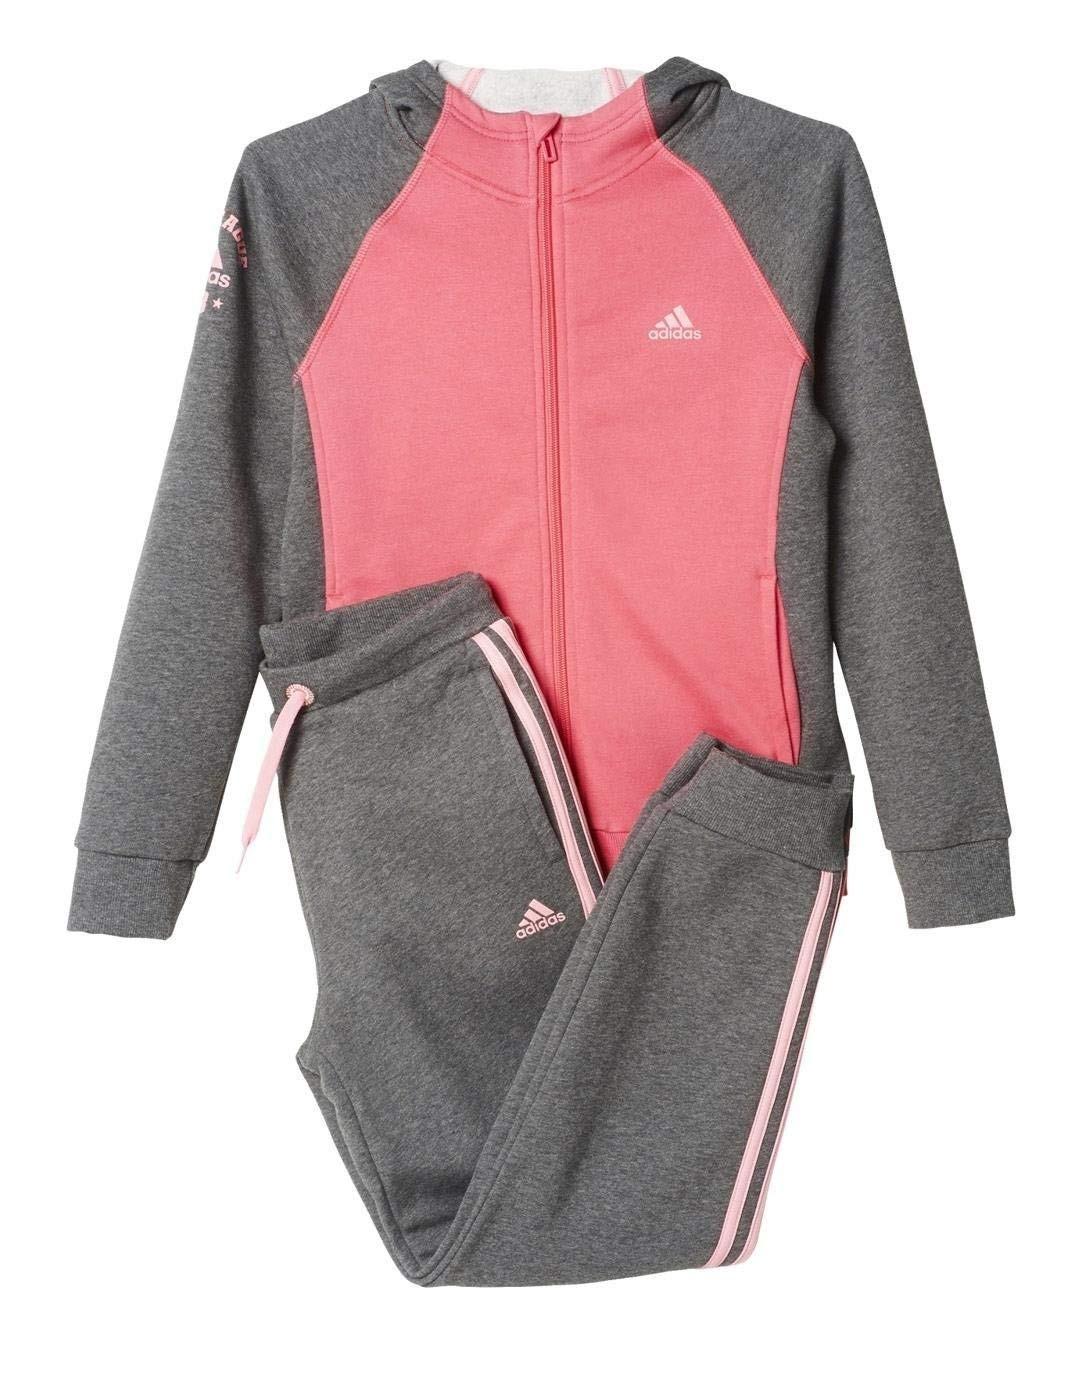 Adidas Traning Cotone Rosa-Grigio Bambina